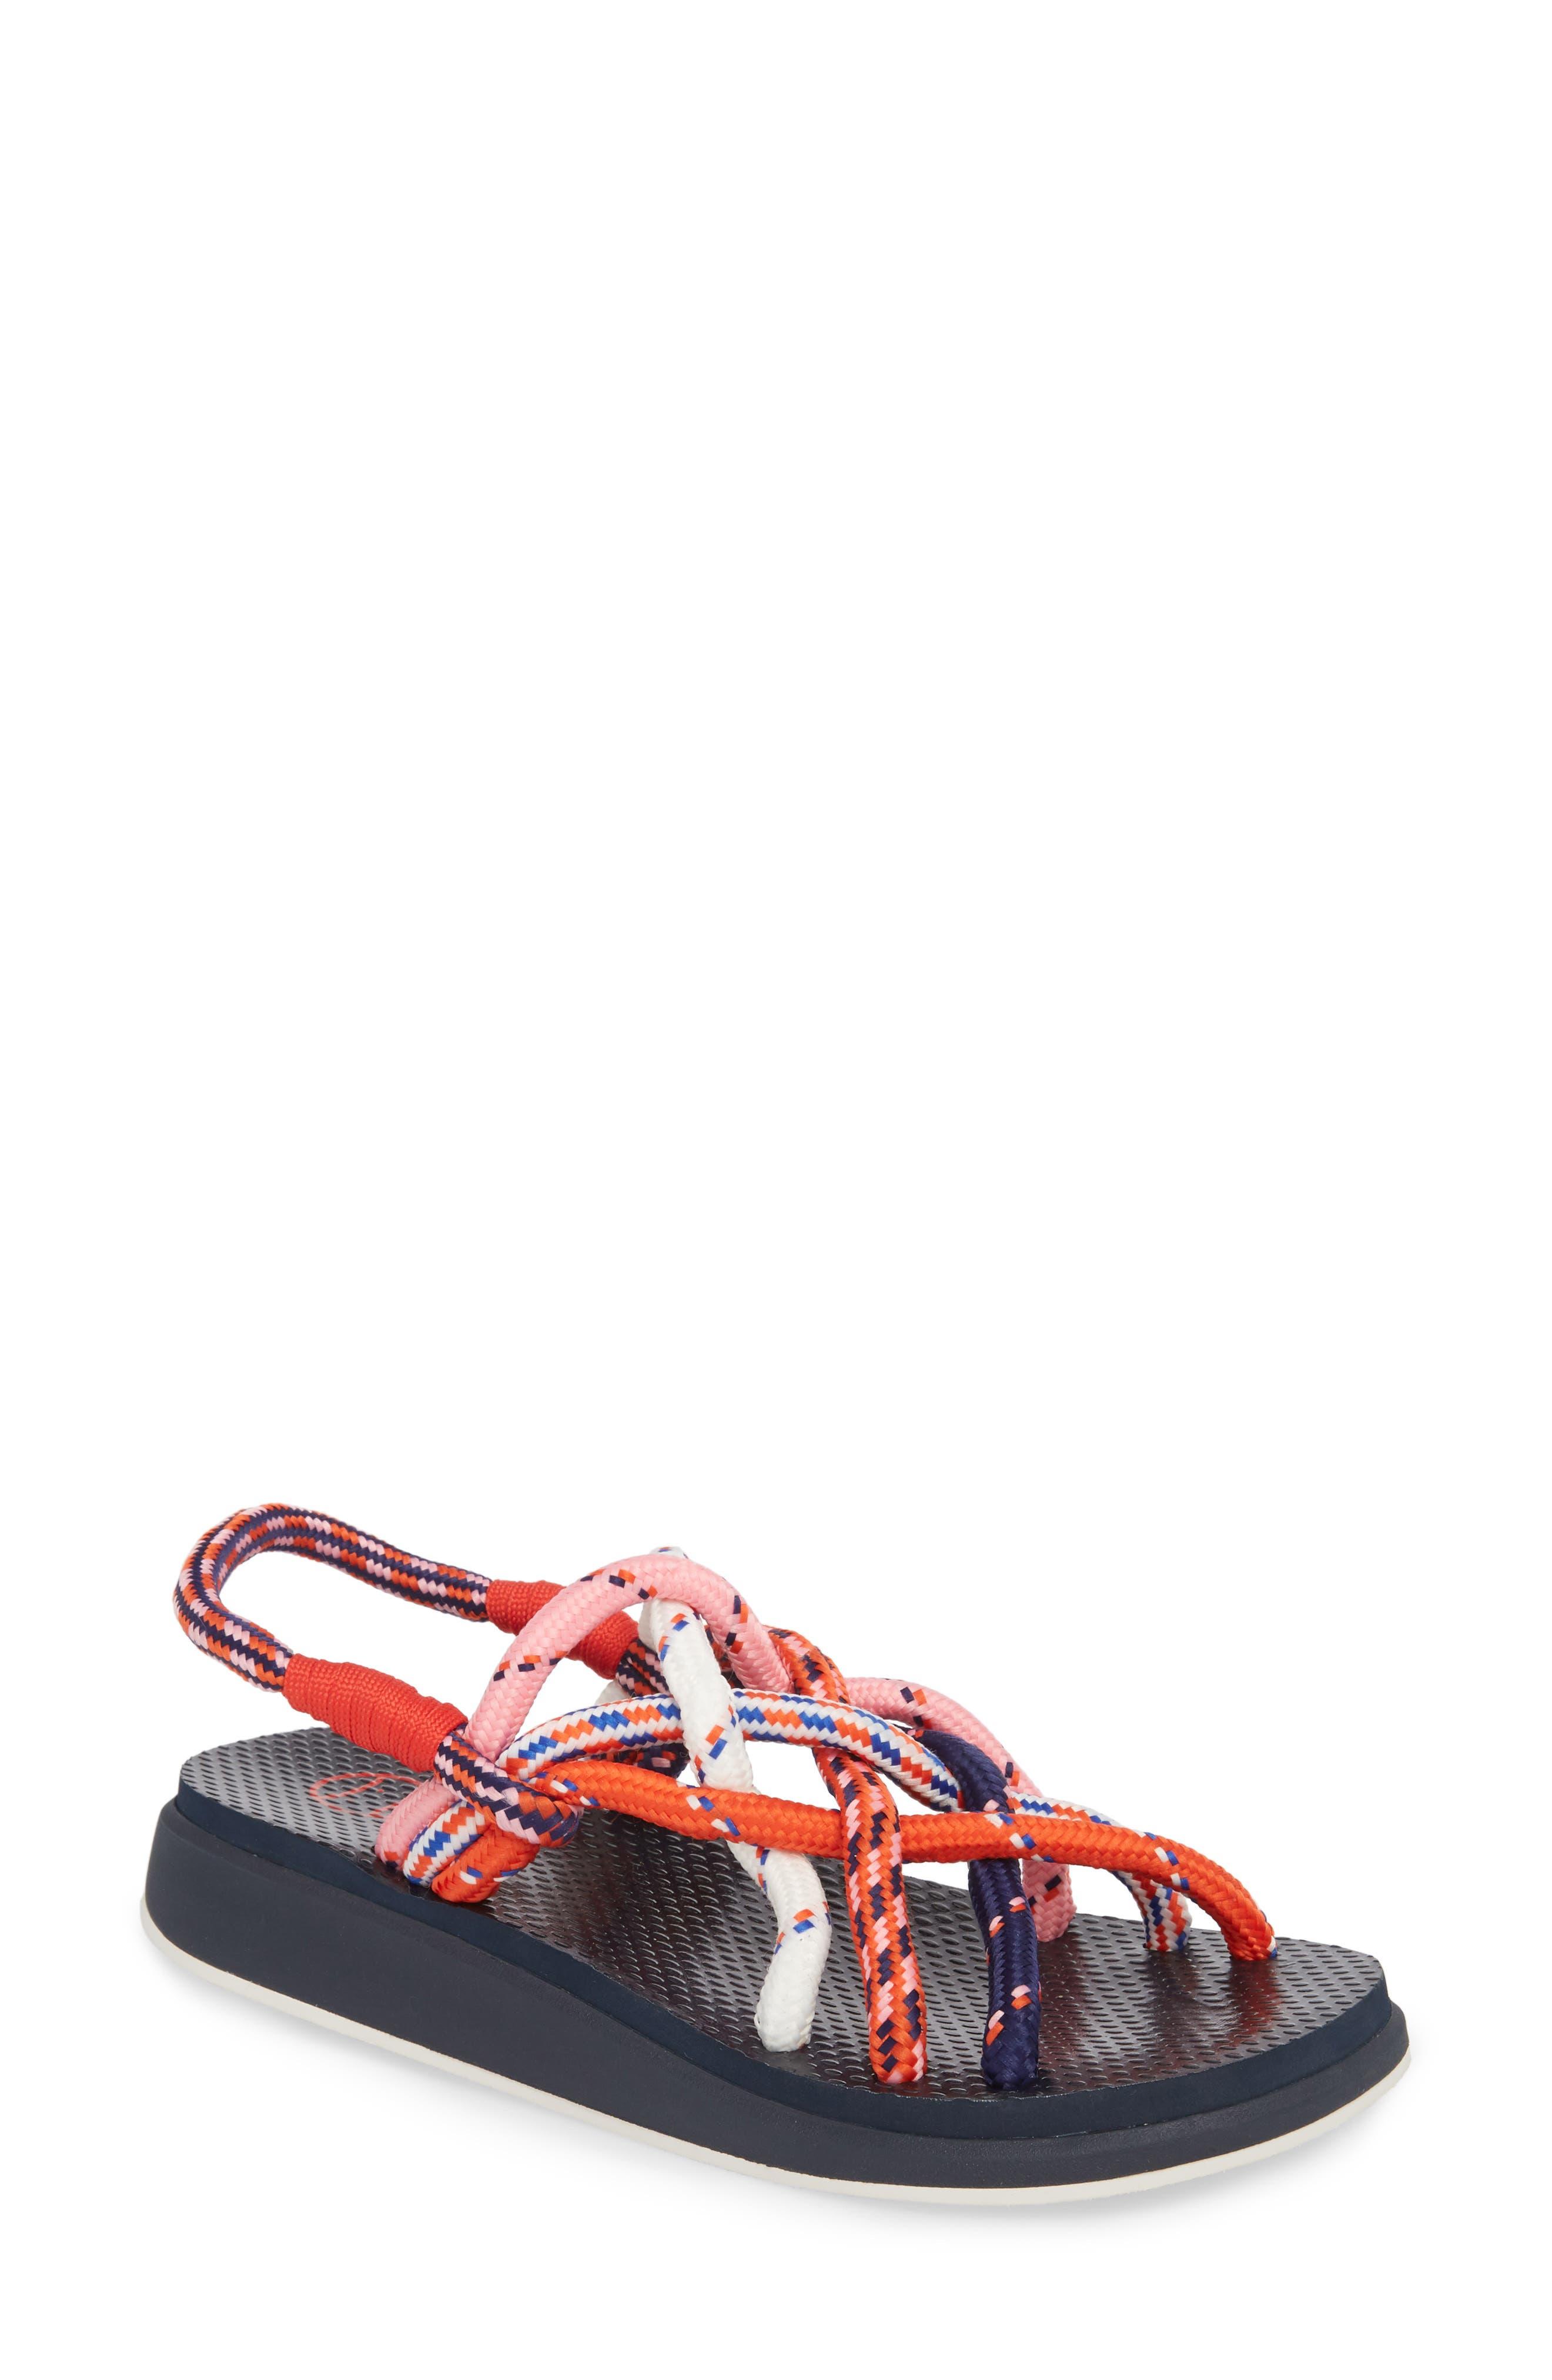 Rope Sandal,                         Main,                         color, 643